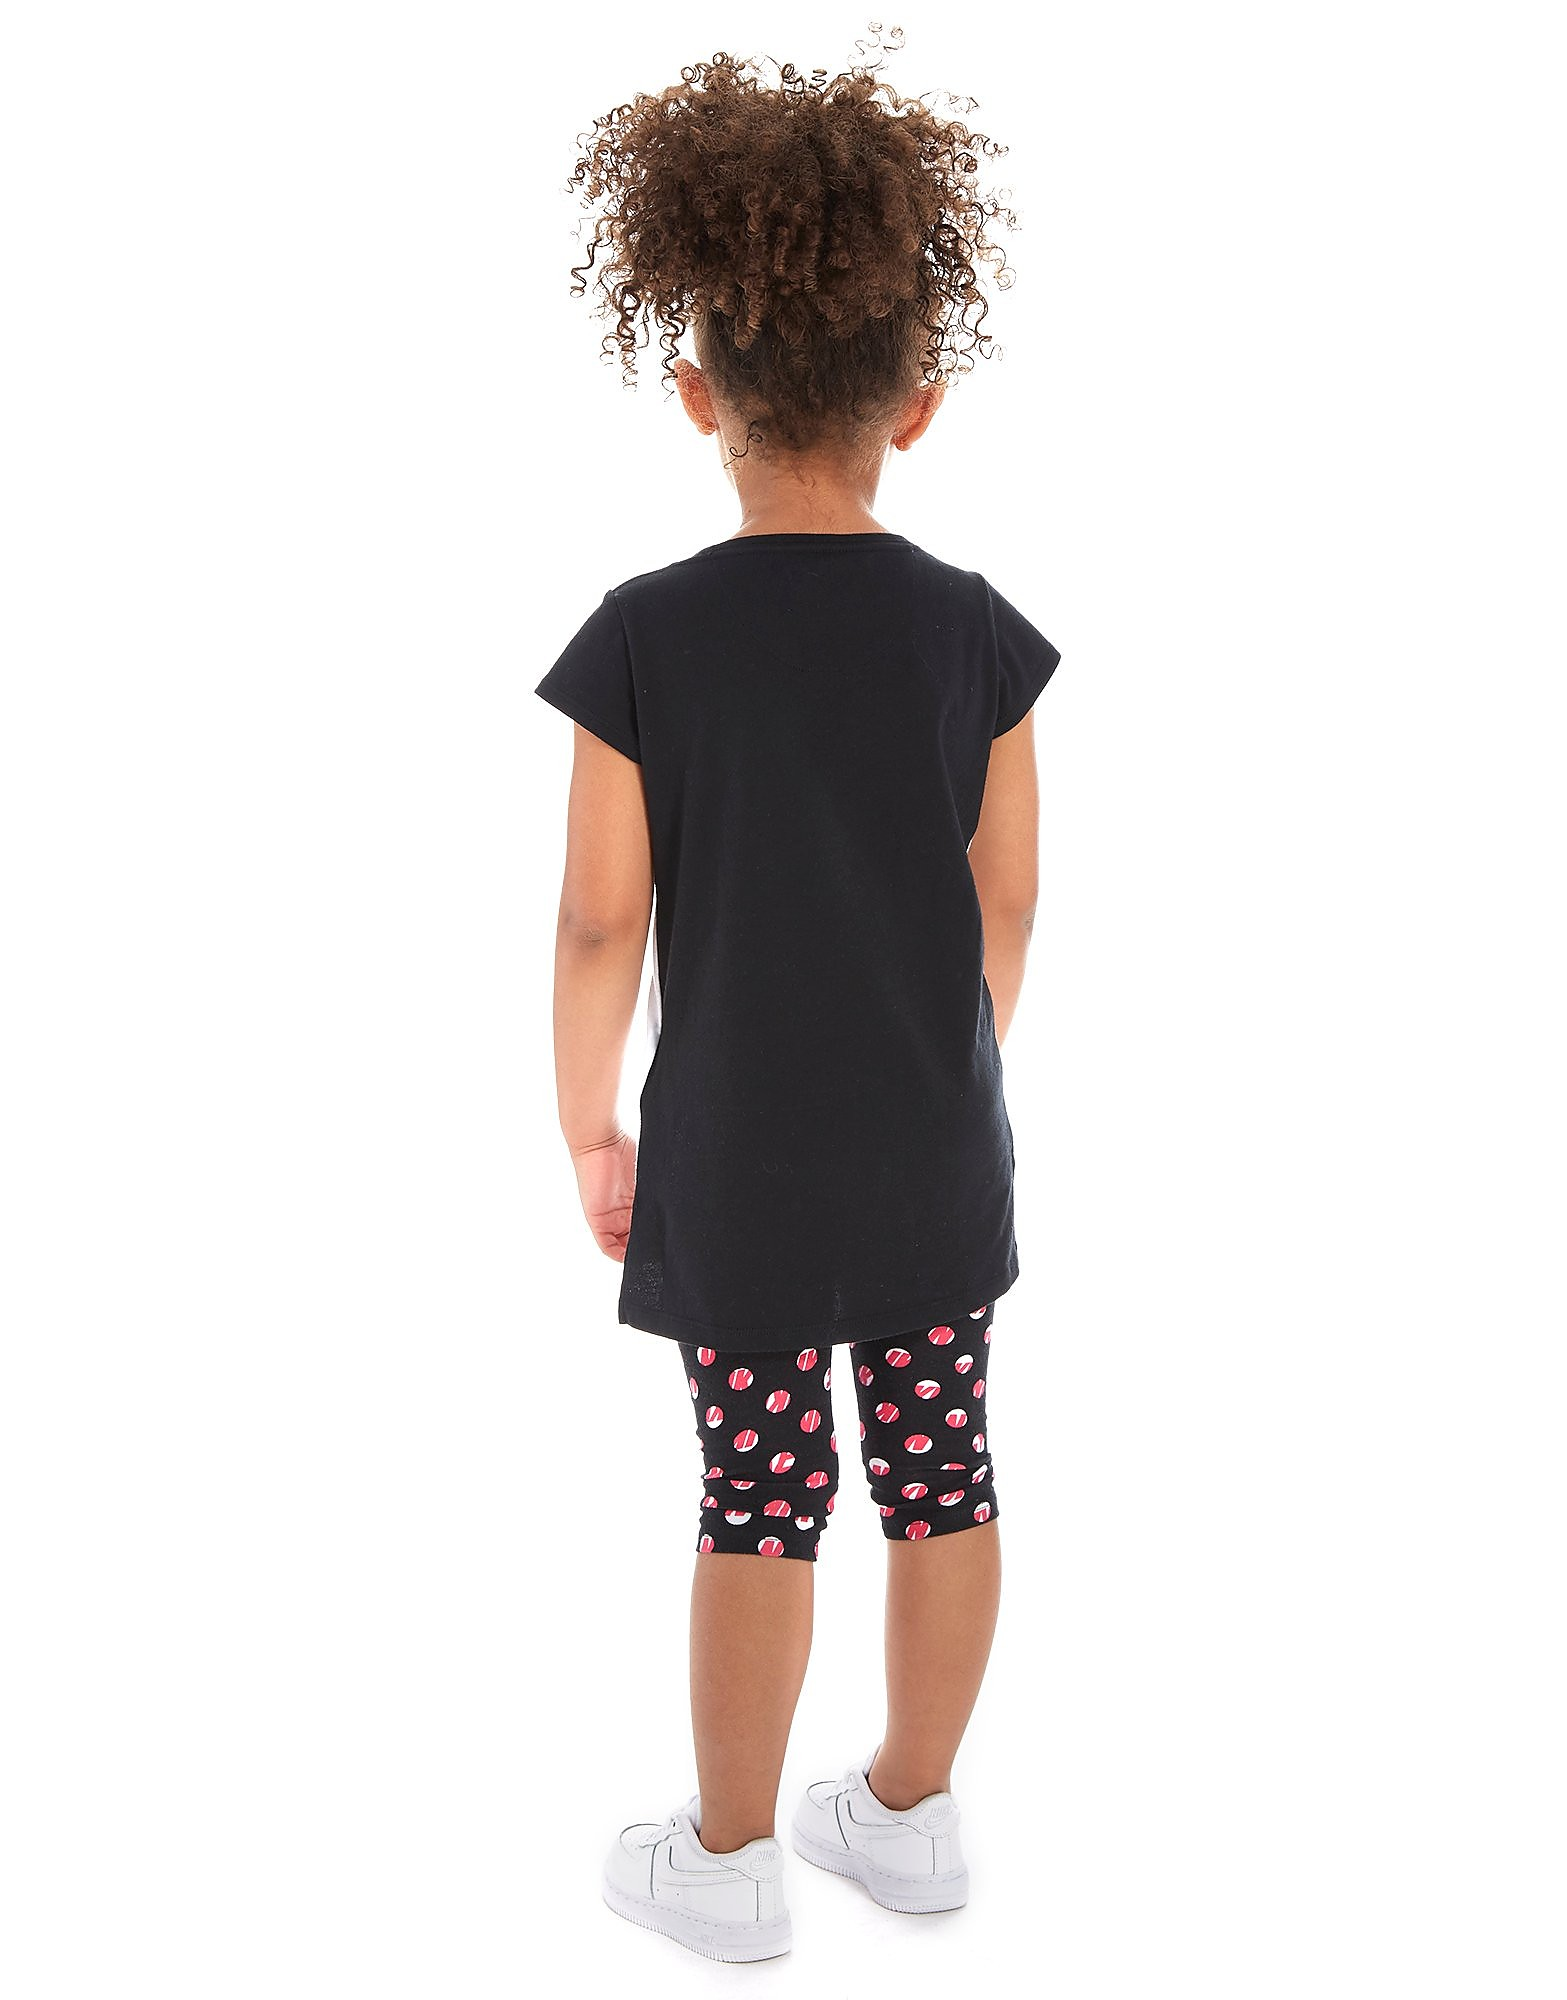 Nike conjunto de camiseta y pantalón pirata de niña infantil